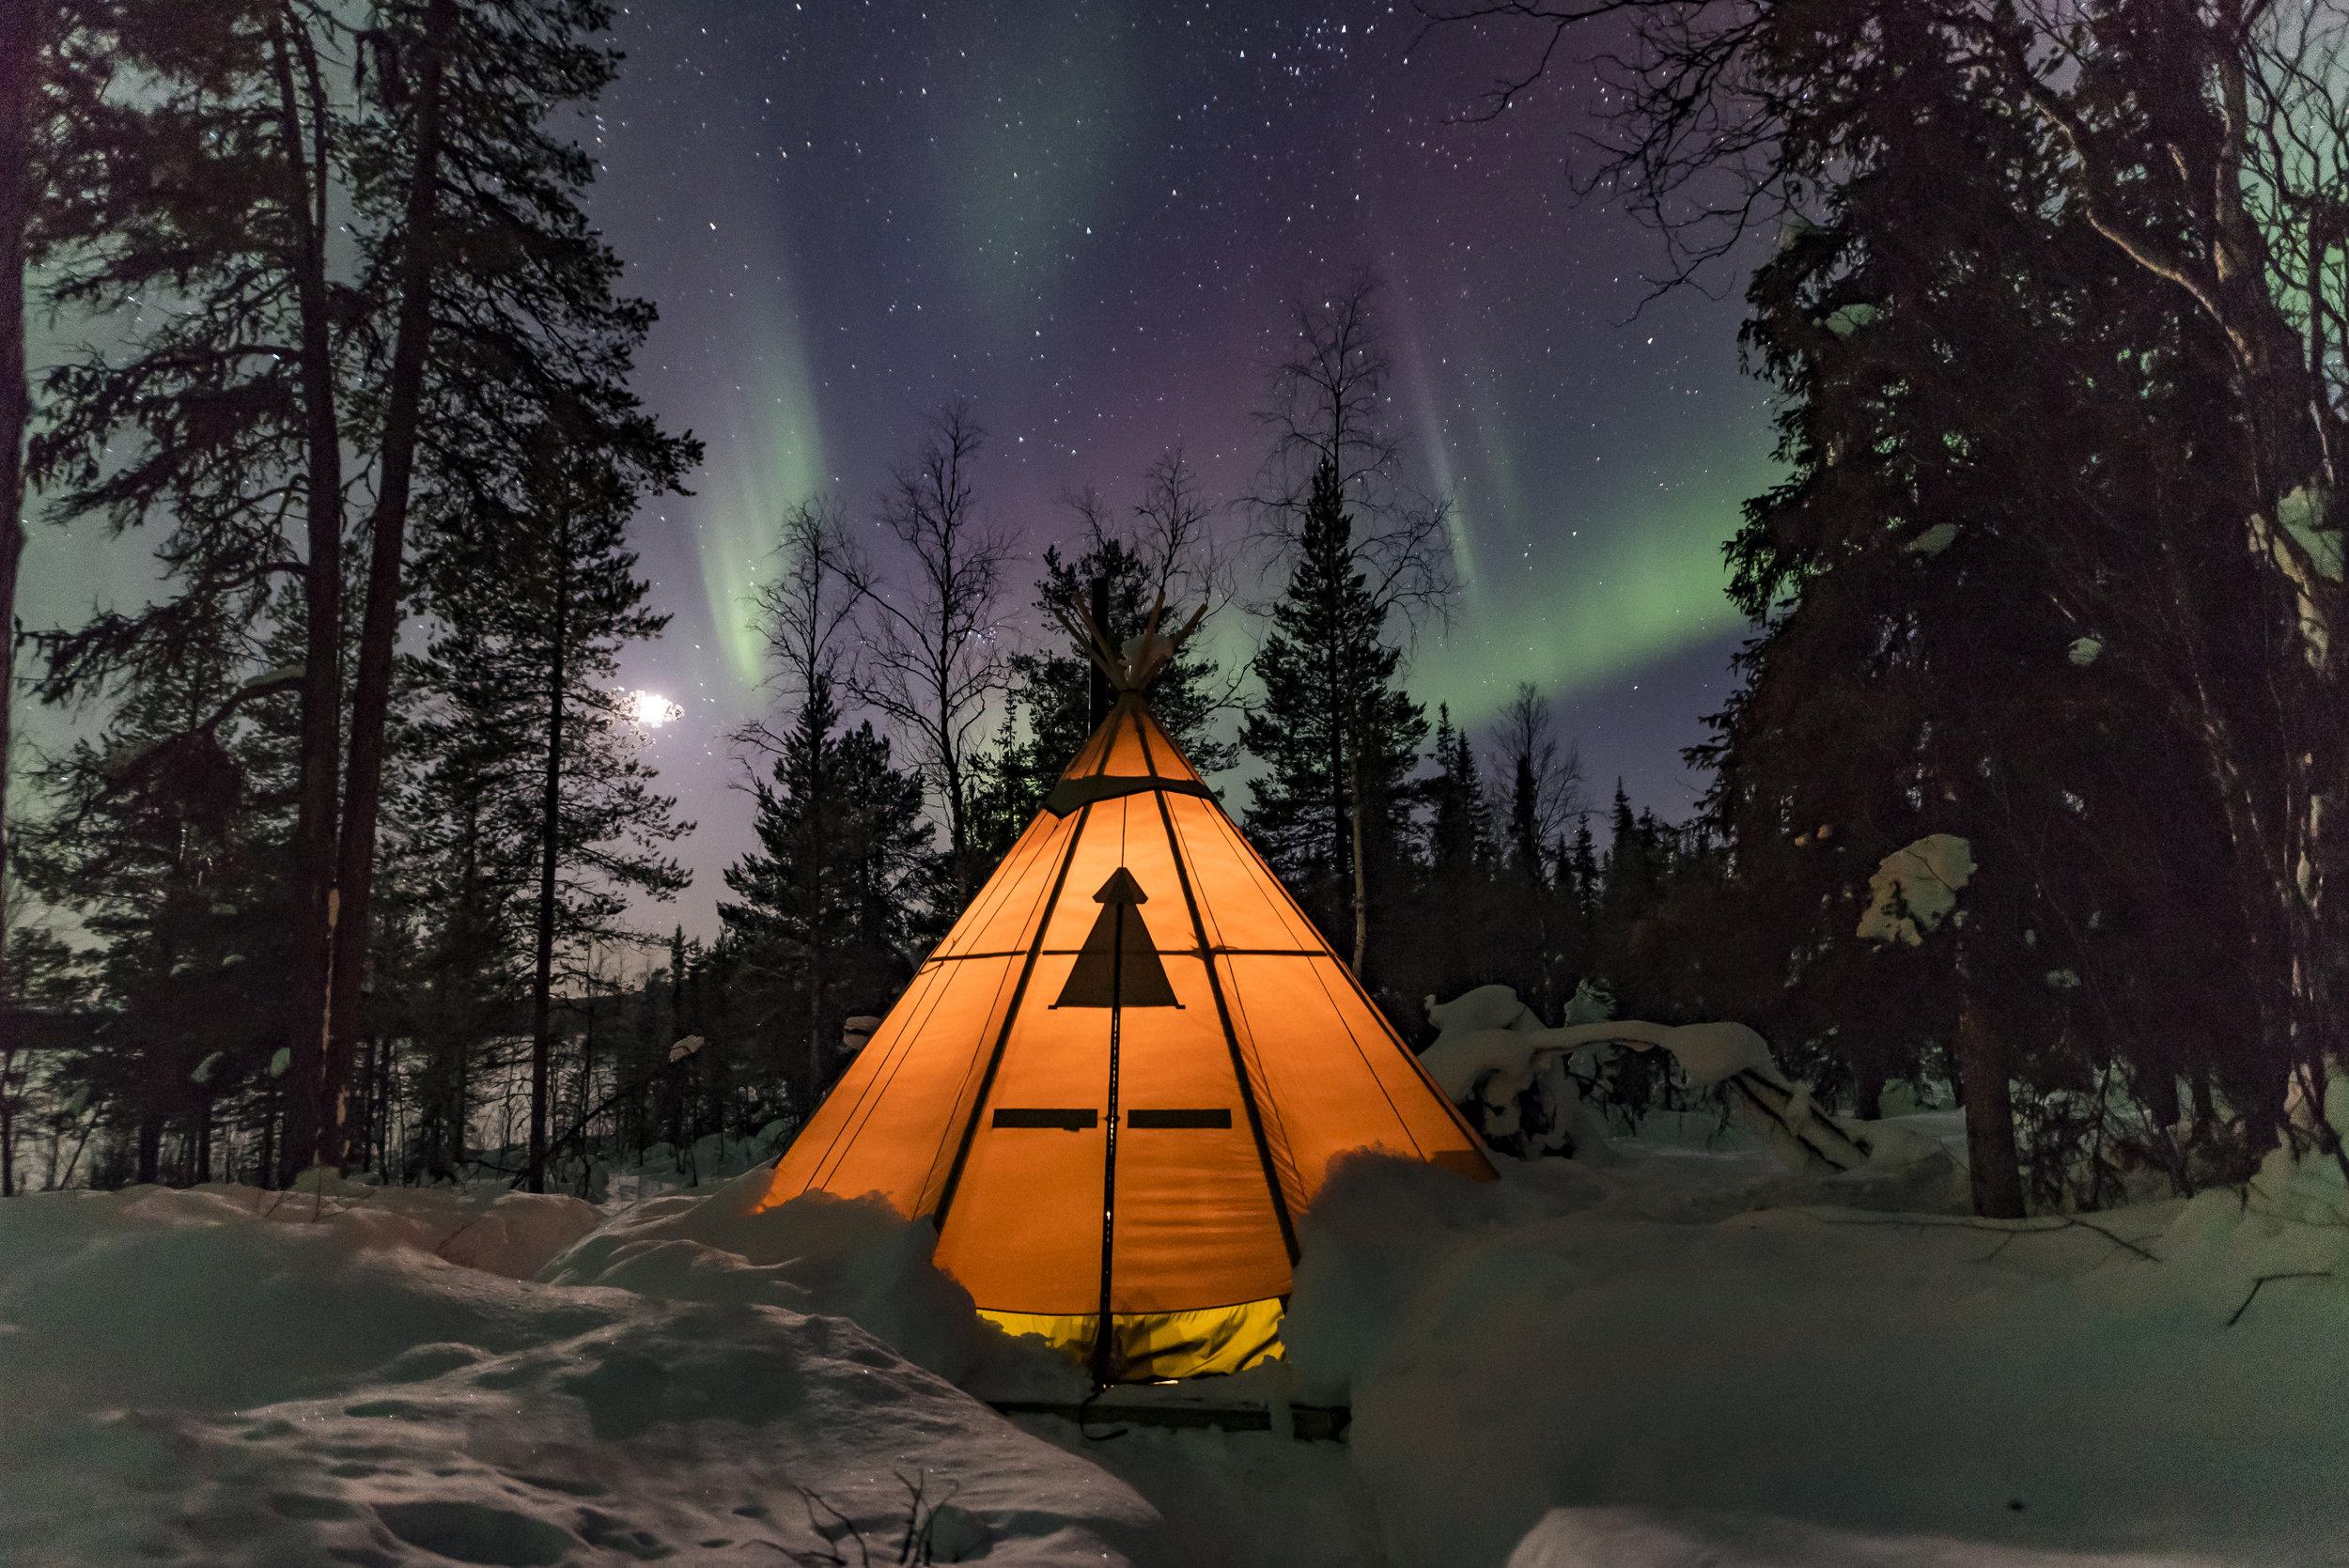 Northern lights over Sámi camp in Swedish Lapland